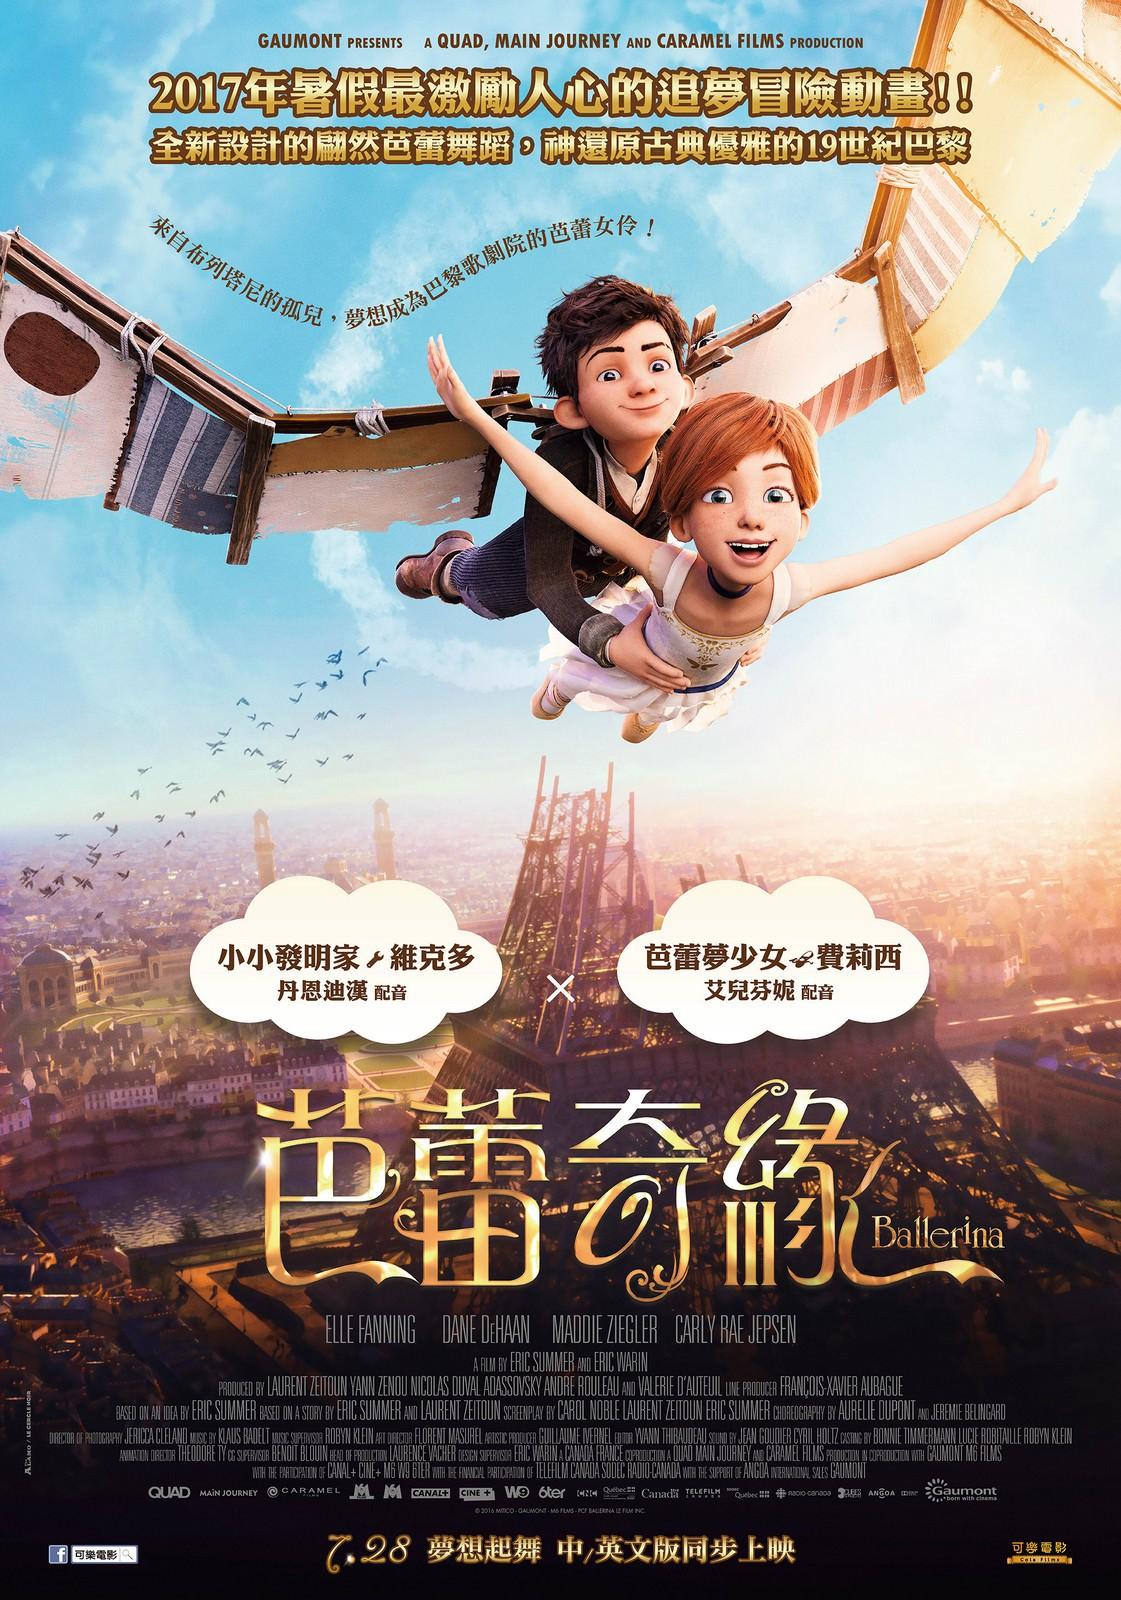 Movie, Ballerina(法國, 2016年) / 芭蕾奇緣(台灣) / 了不起的菲丽西(中國) / 天使愛芭蕾(香港), 電影海報, 台灣